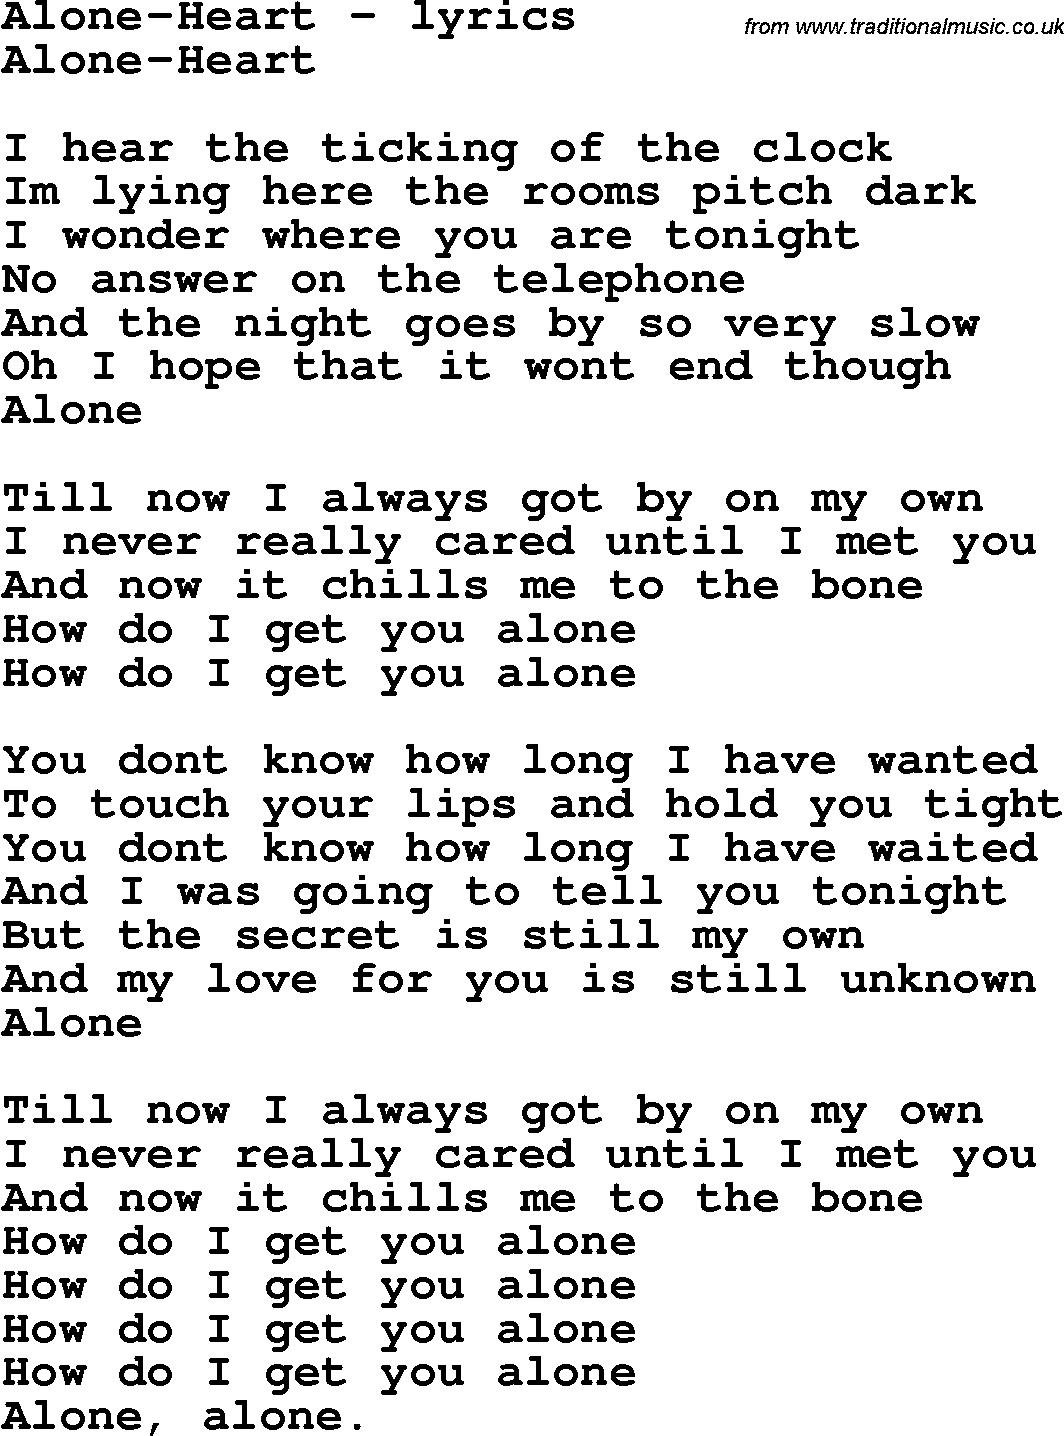 Lirik Alone Heart : lirik, alone, heart, Lyrics, For:Alone-Heart